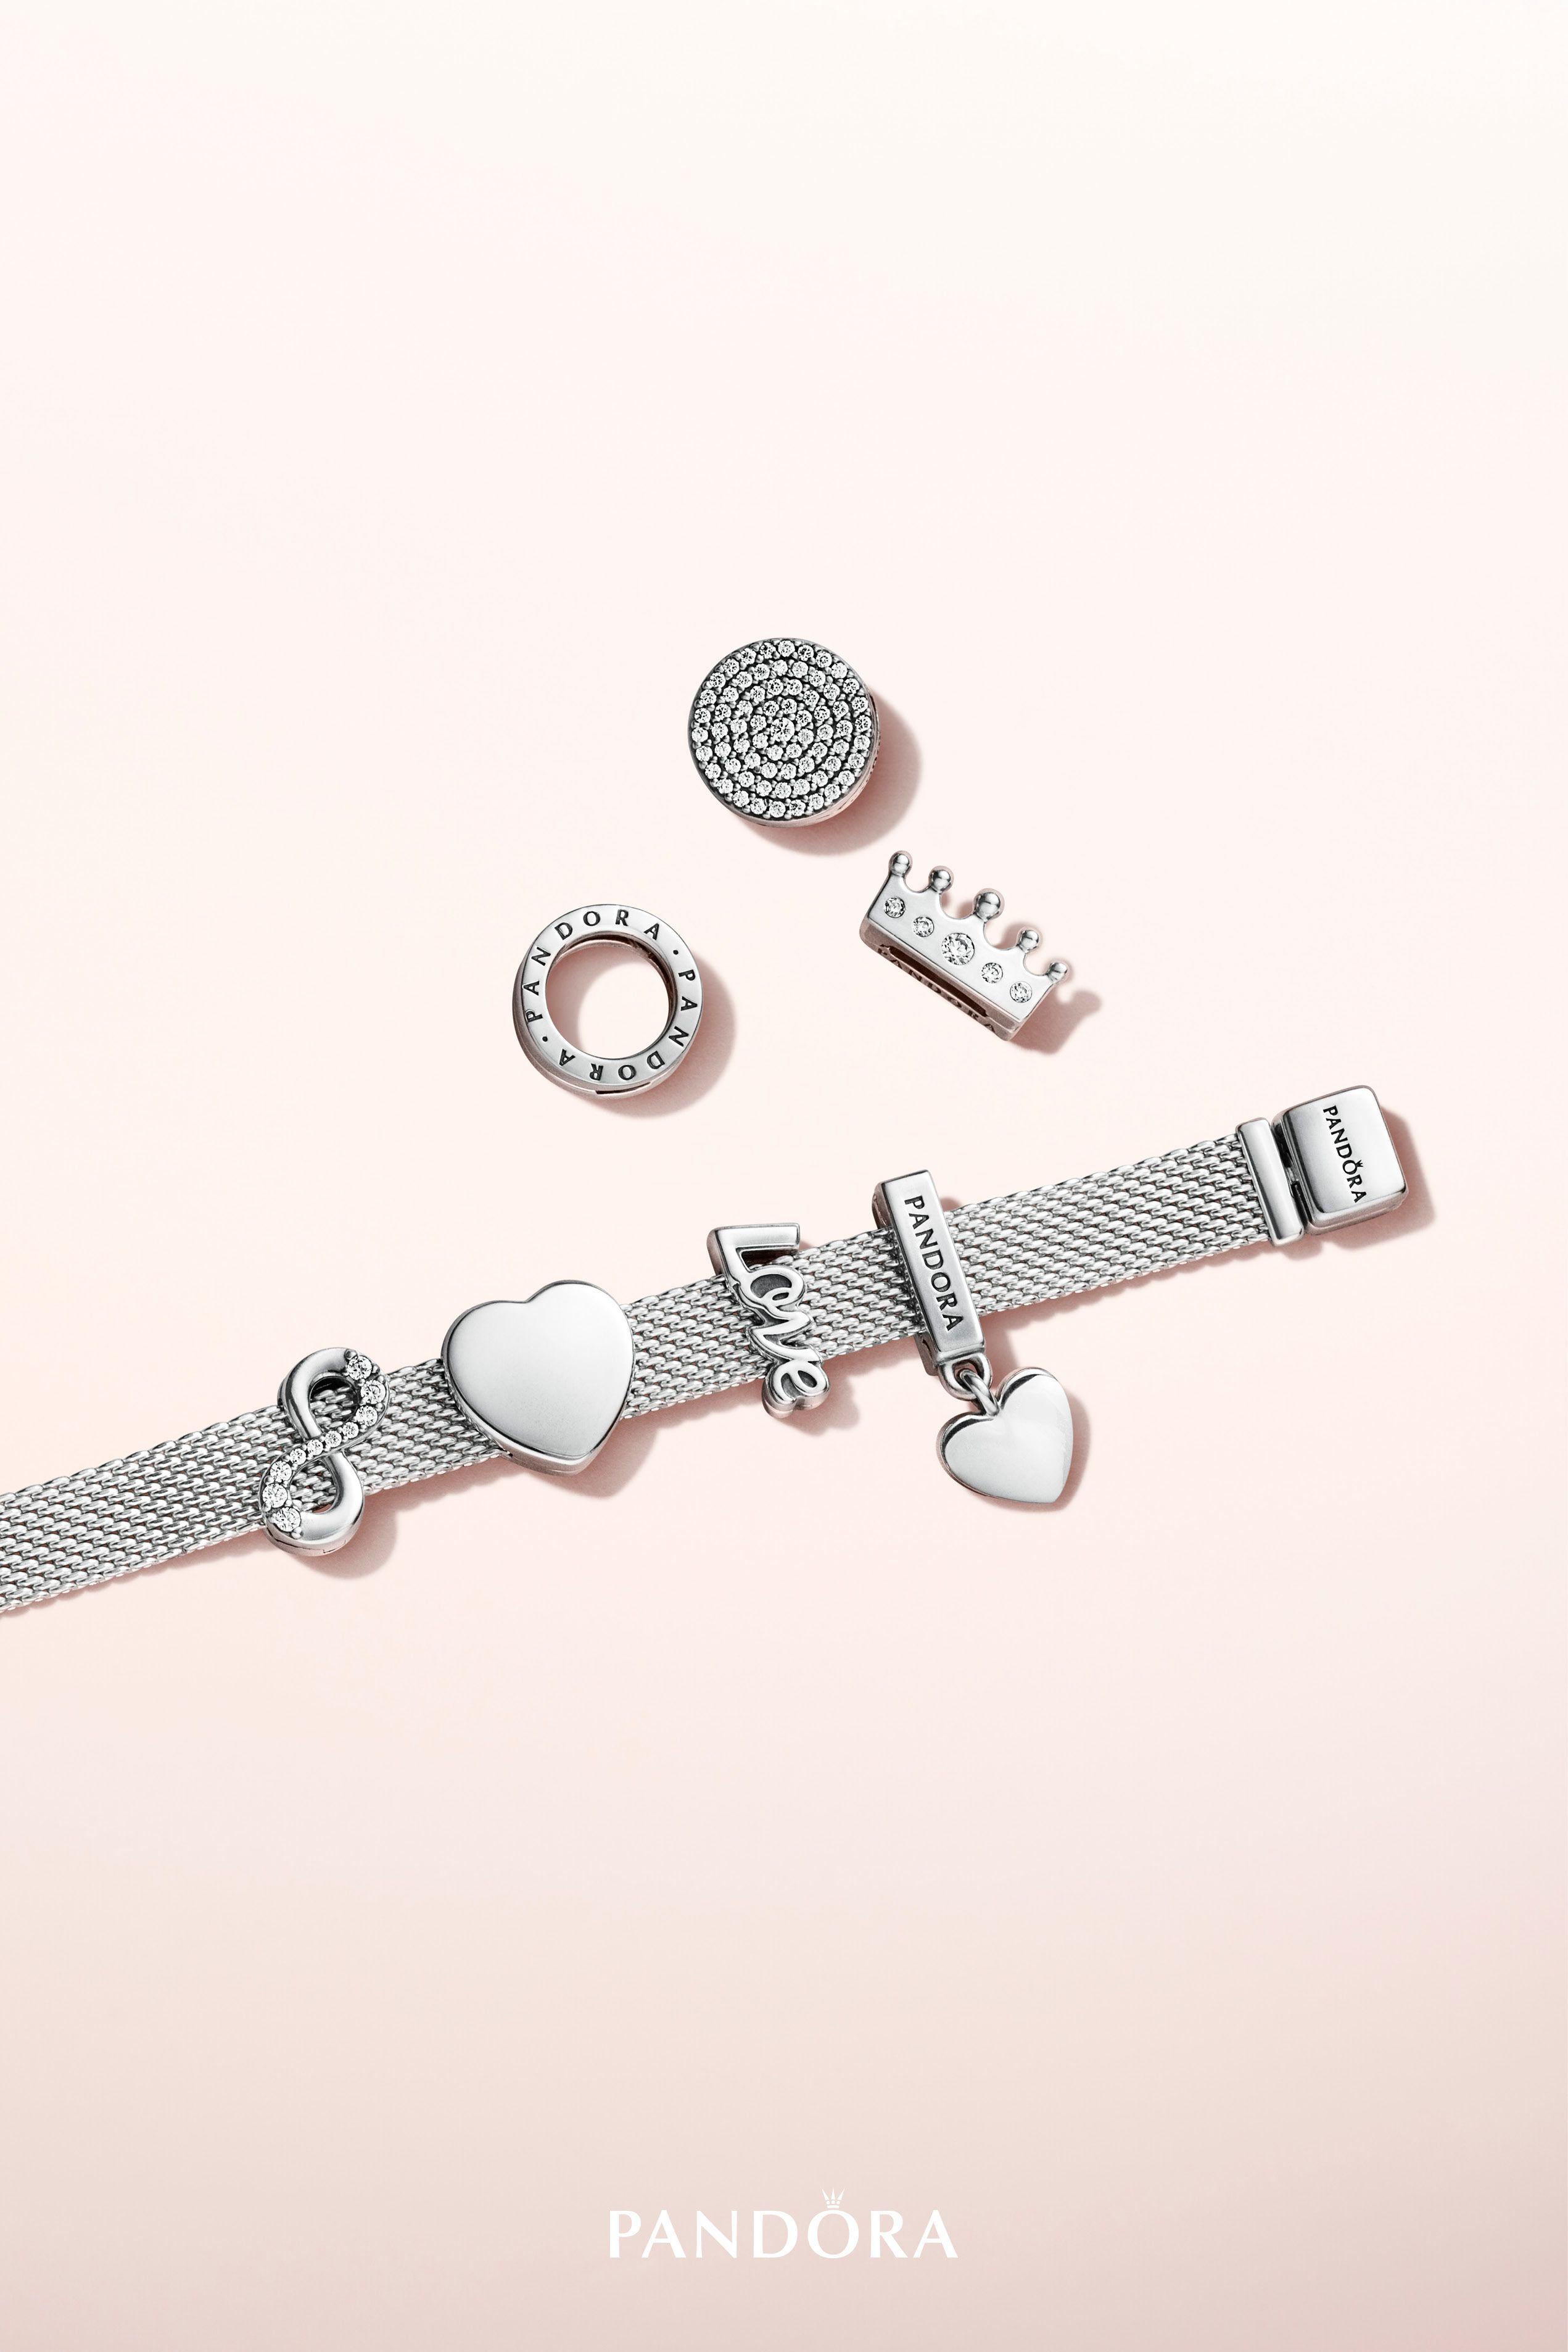 pandora infinity charm bracelet